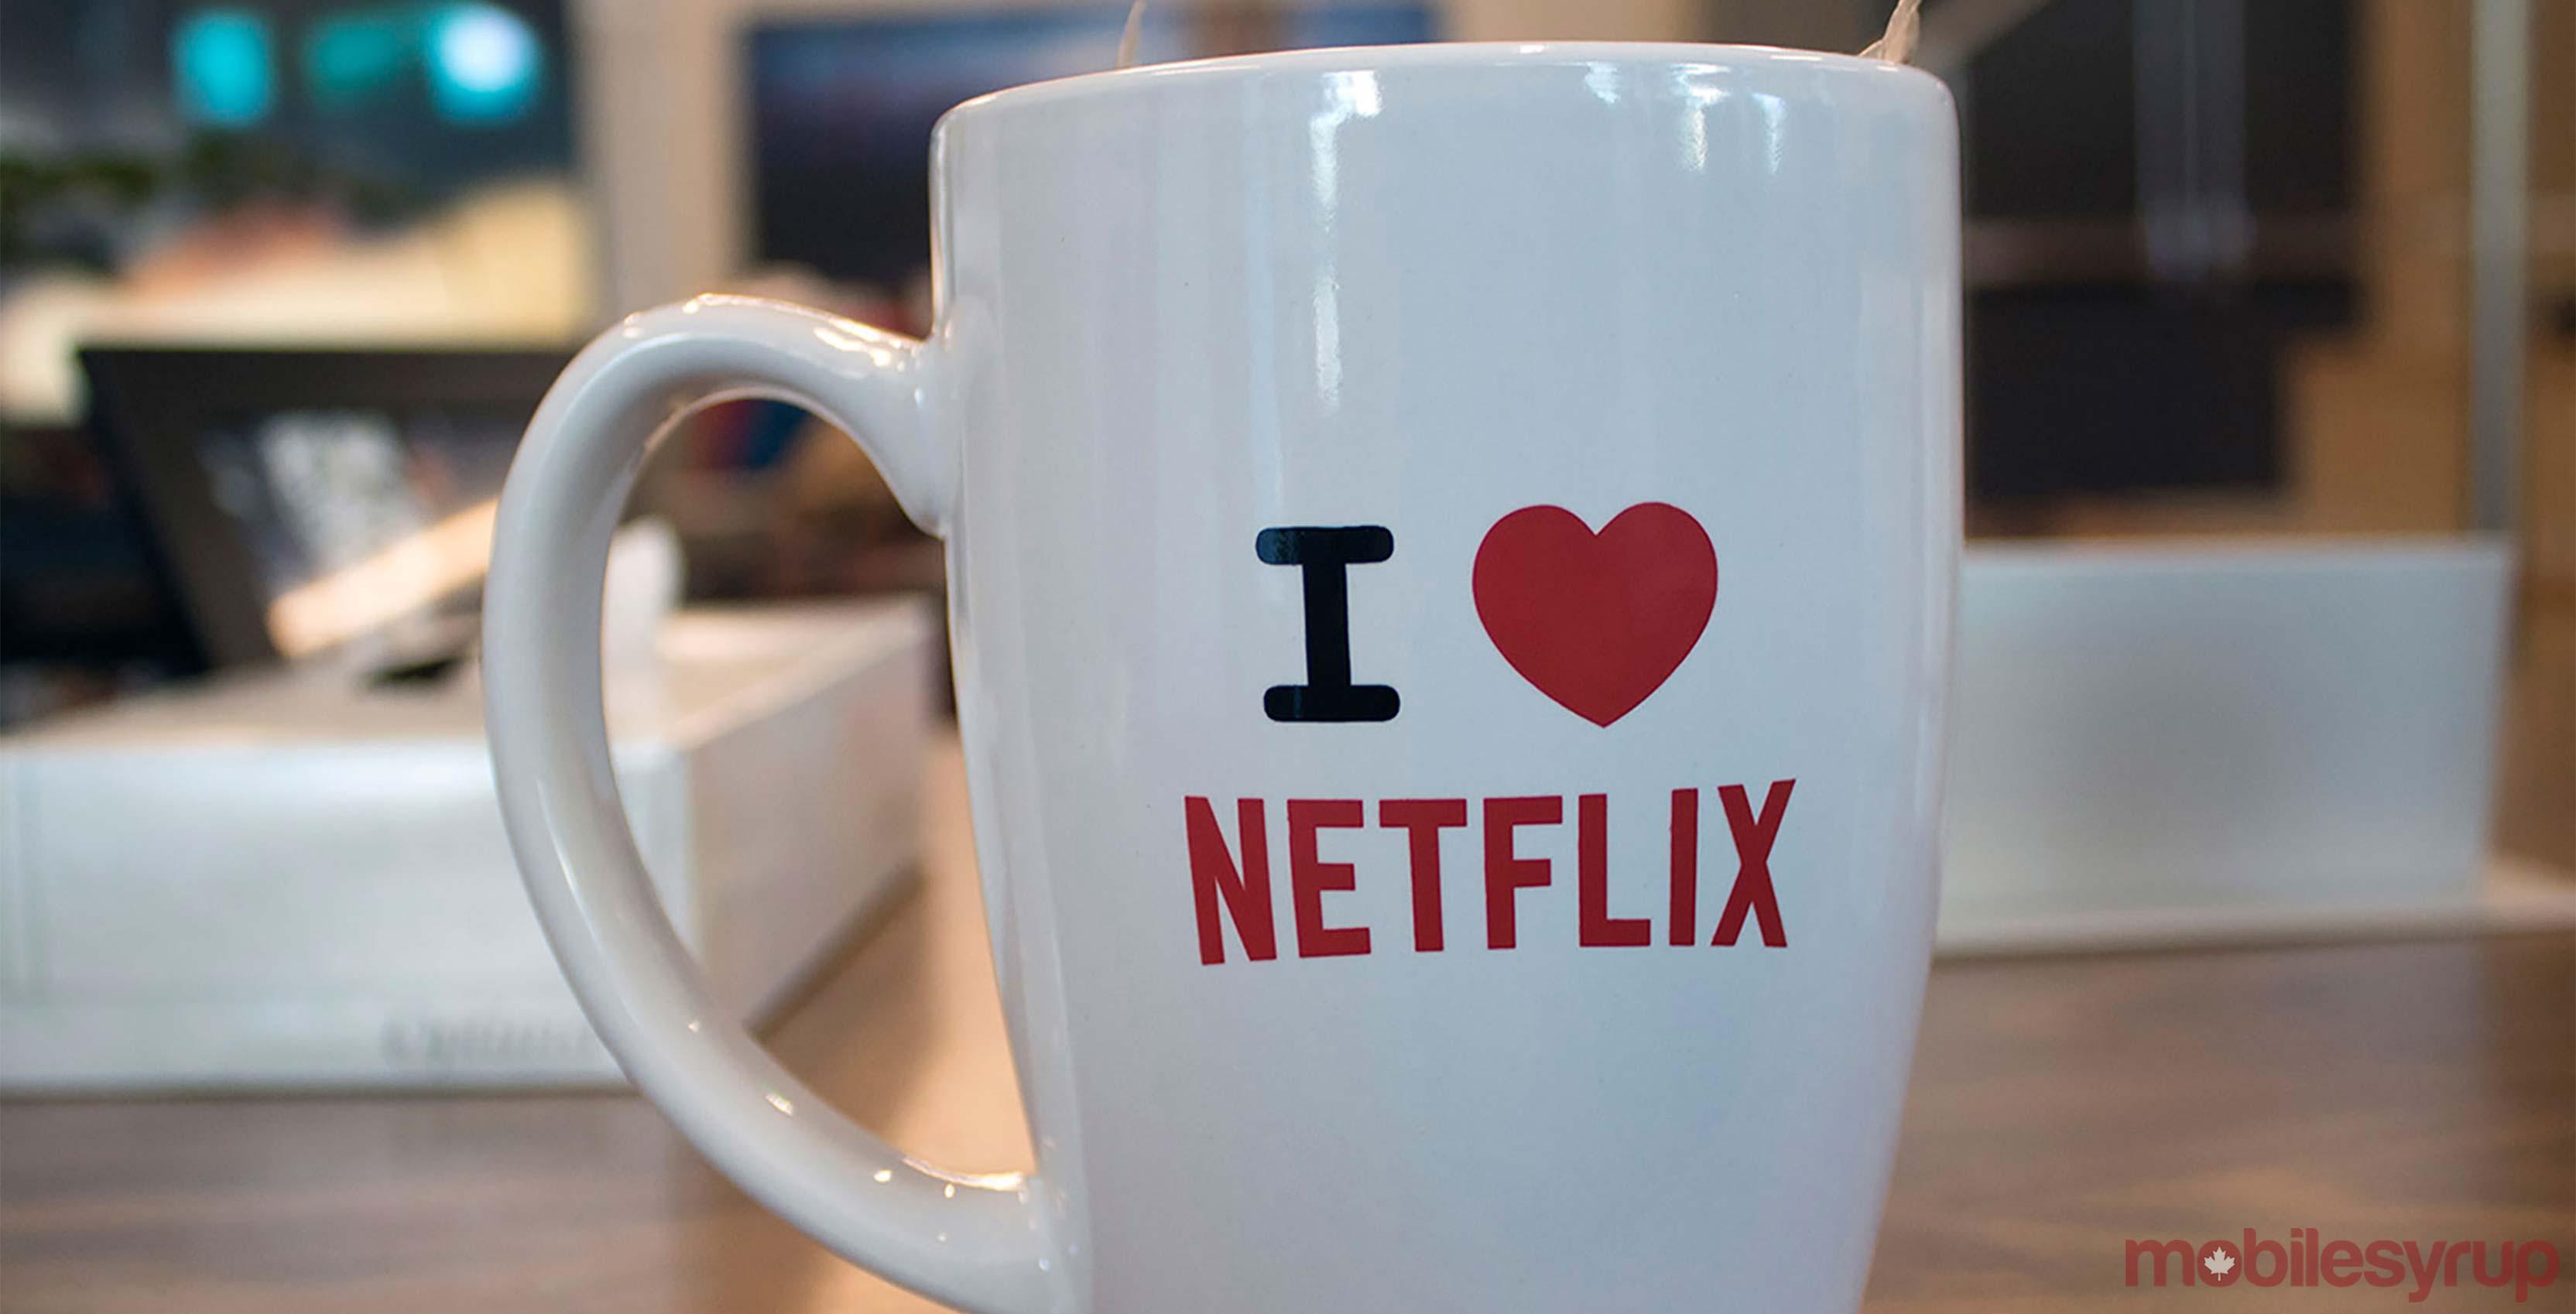 Netflix mug